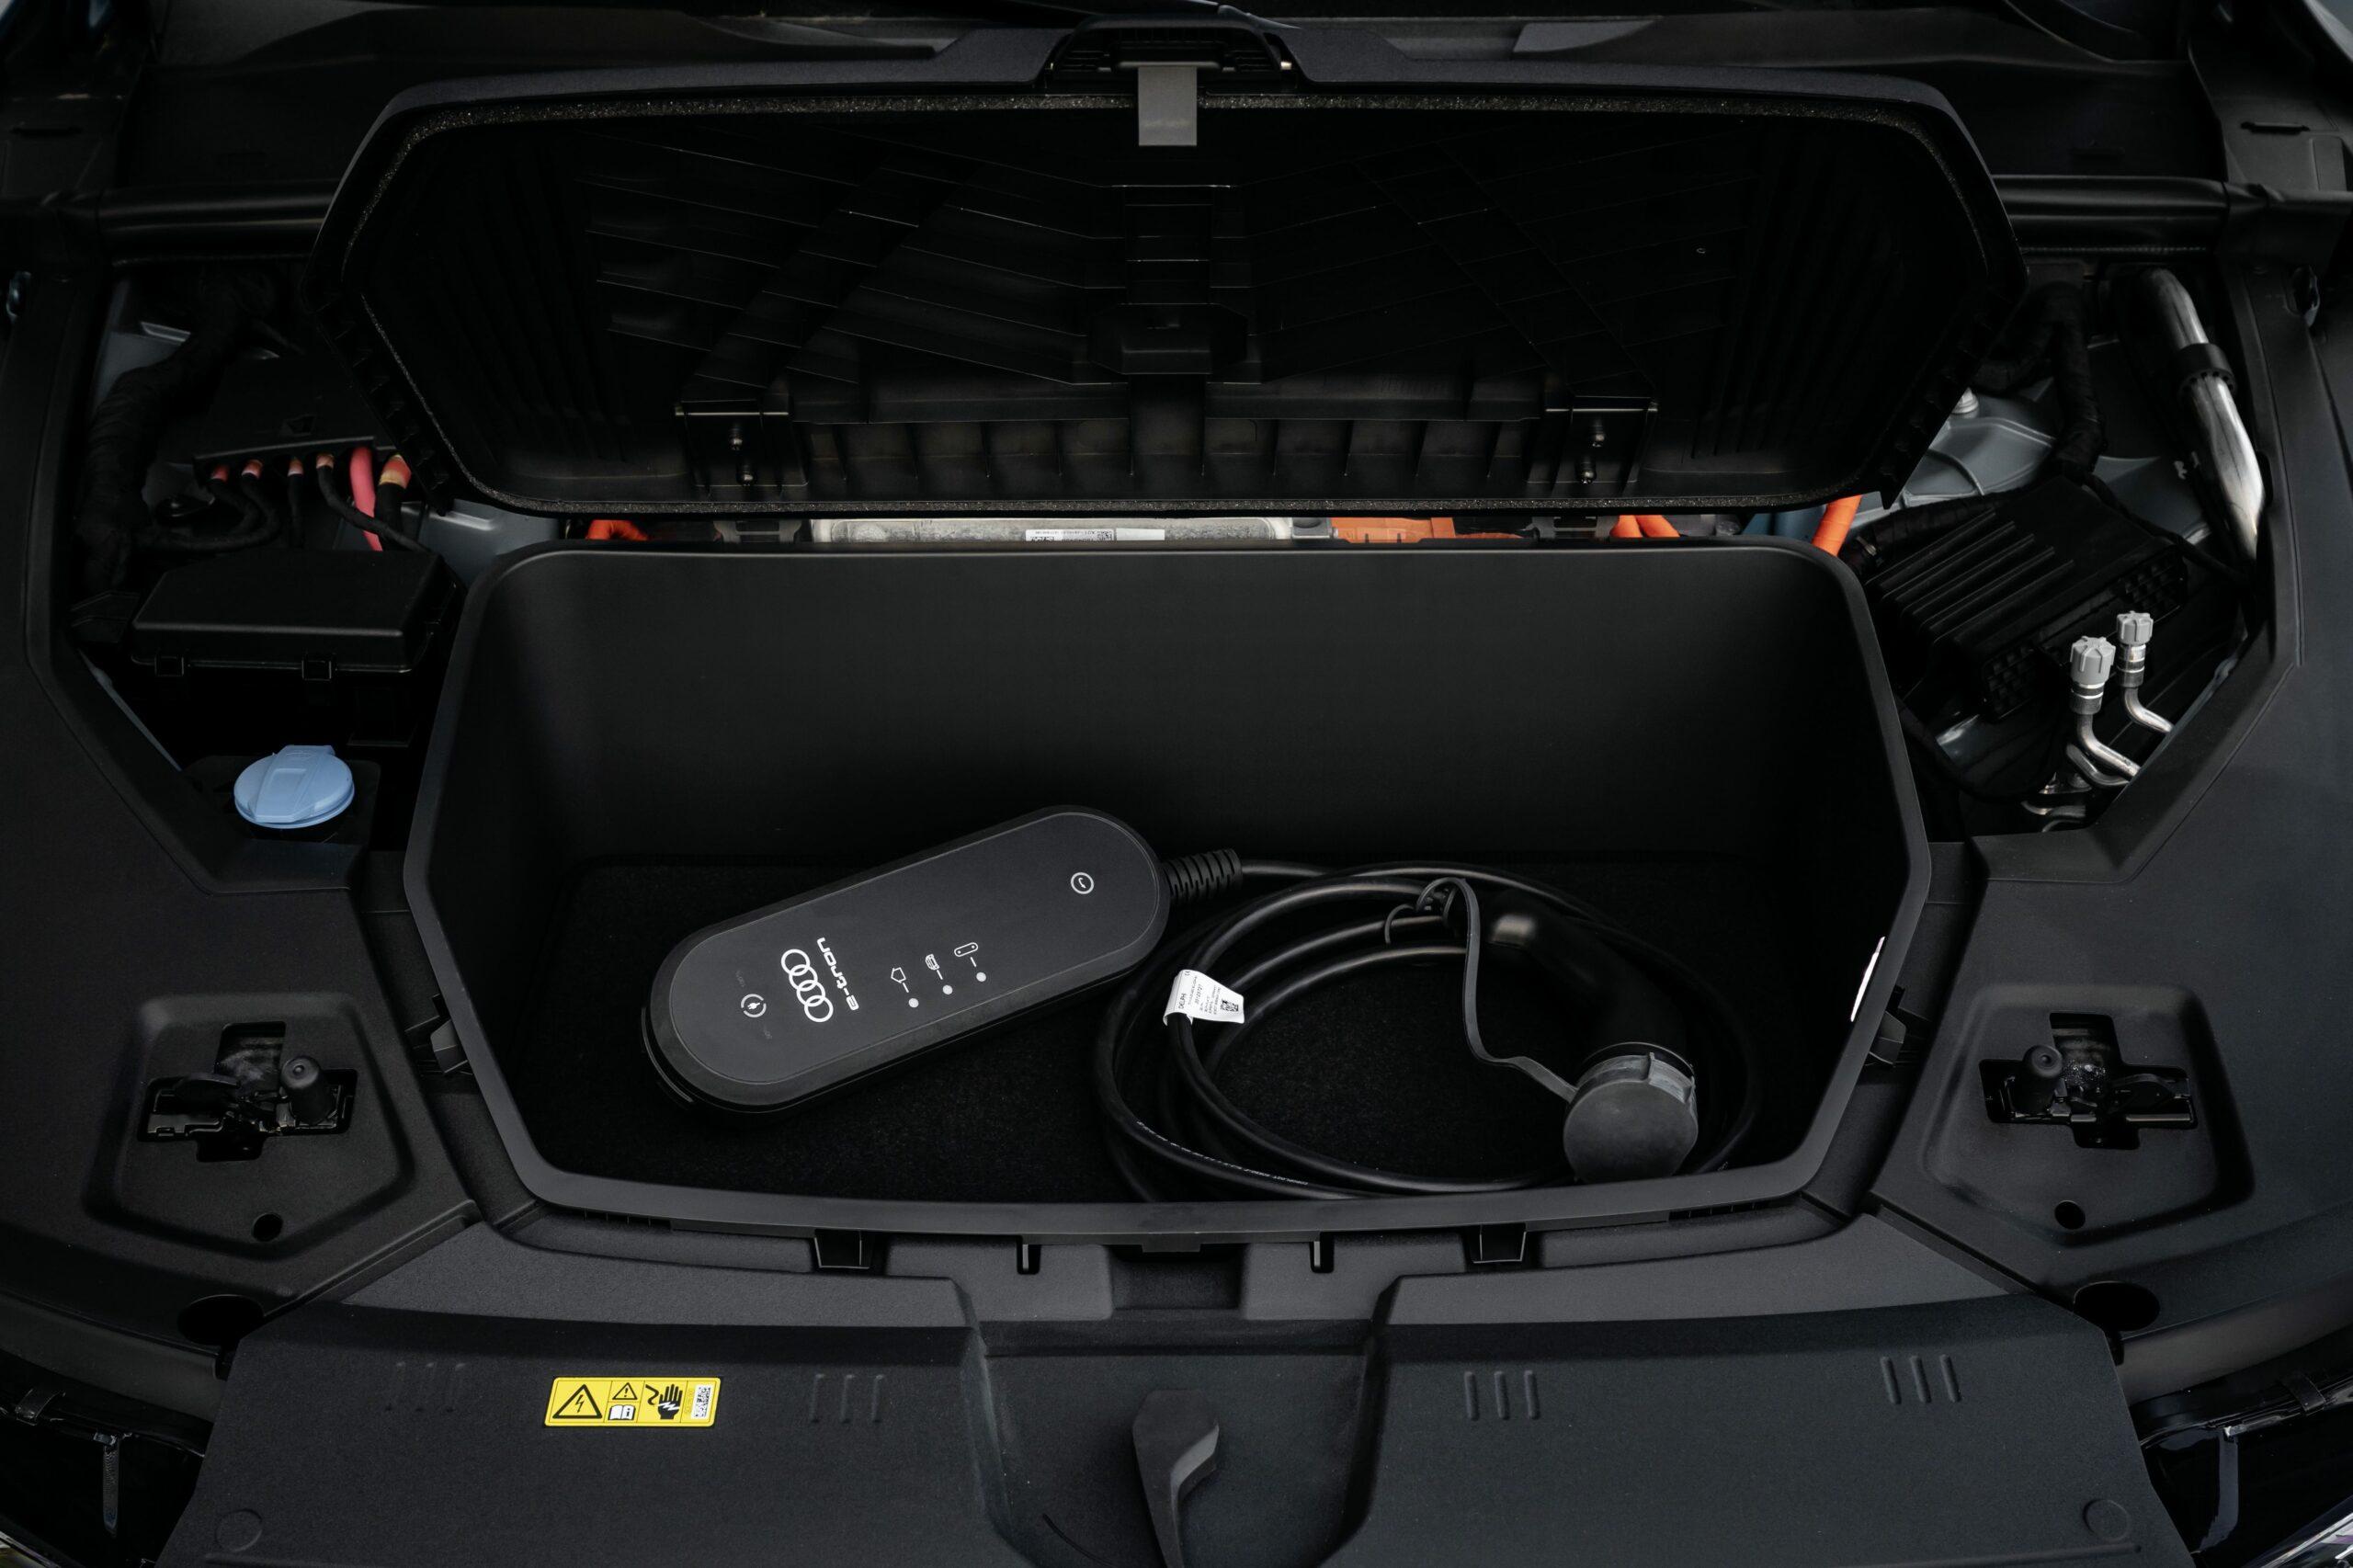 Audi announces new charging options